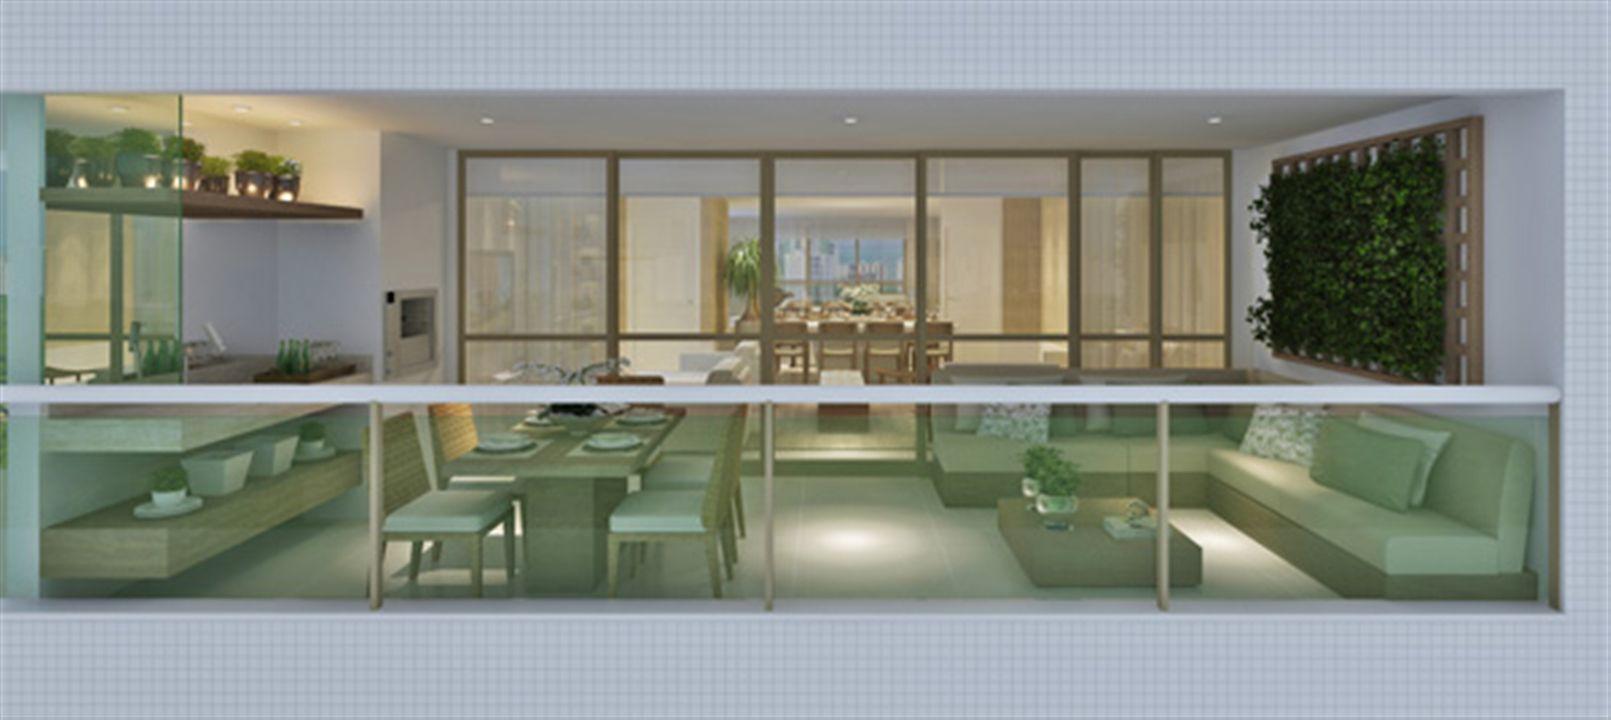 Perspectiva ilustrada da varanda gourmet apartamento decorado 170,18m²